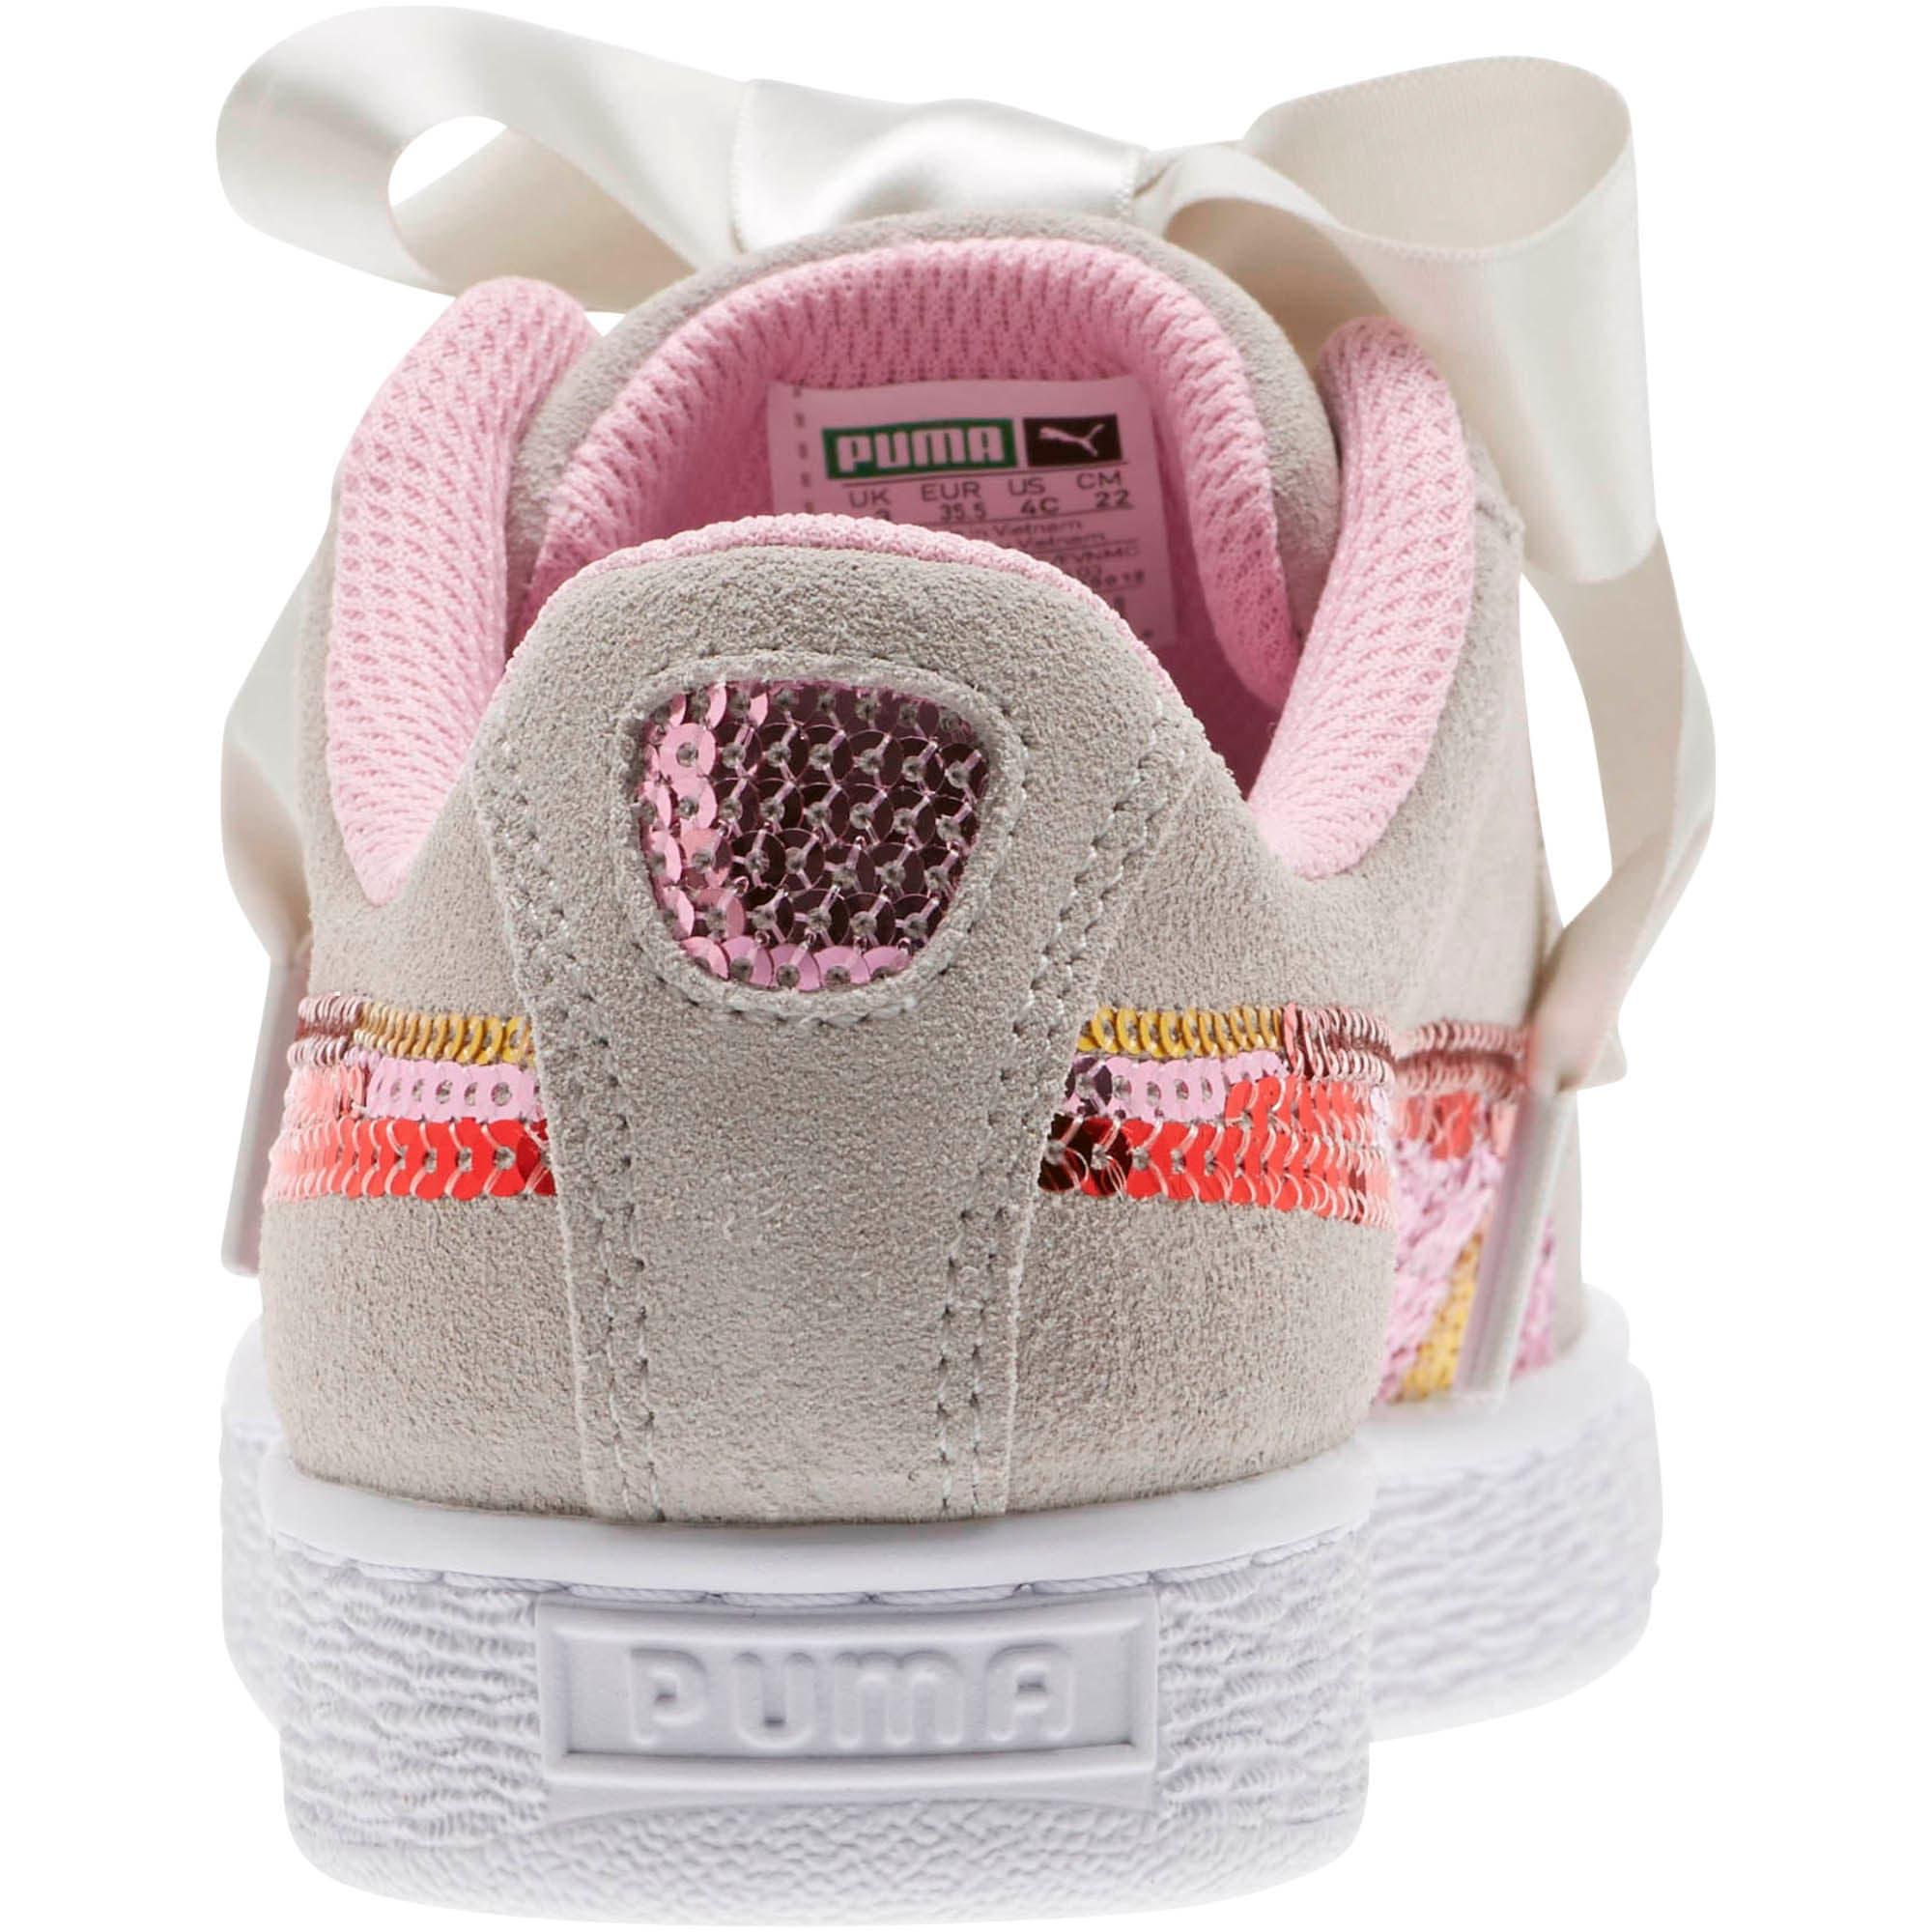 Thumbnail 4 of Suede Heart Trailblazer Sequin Sneakers JR, Gray Violet-Pale Pink, medium